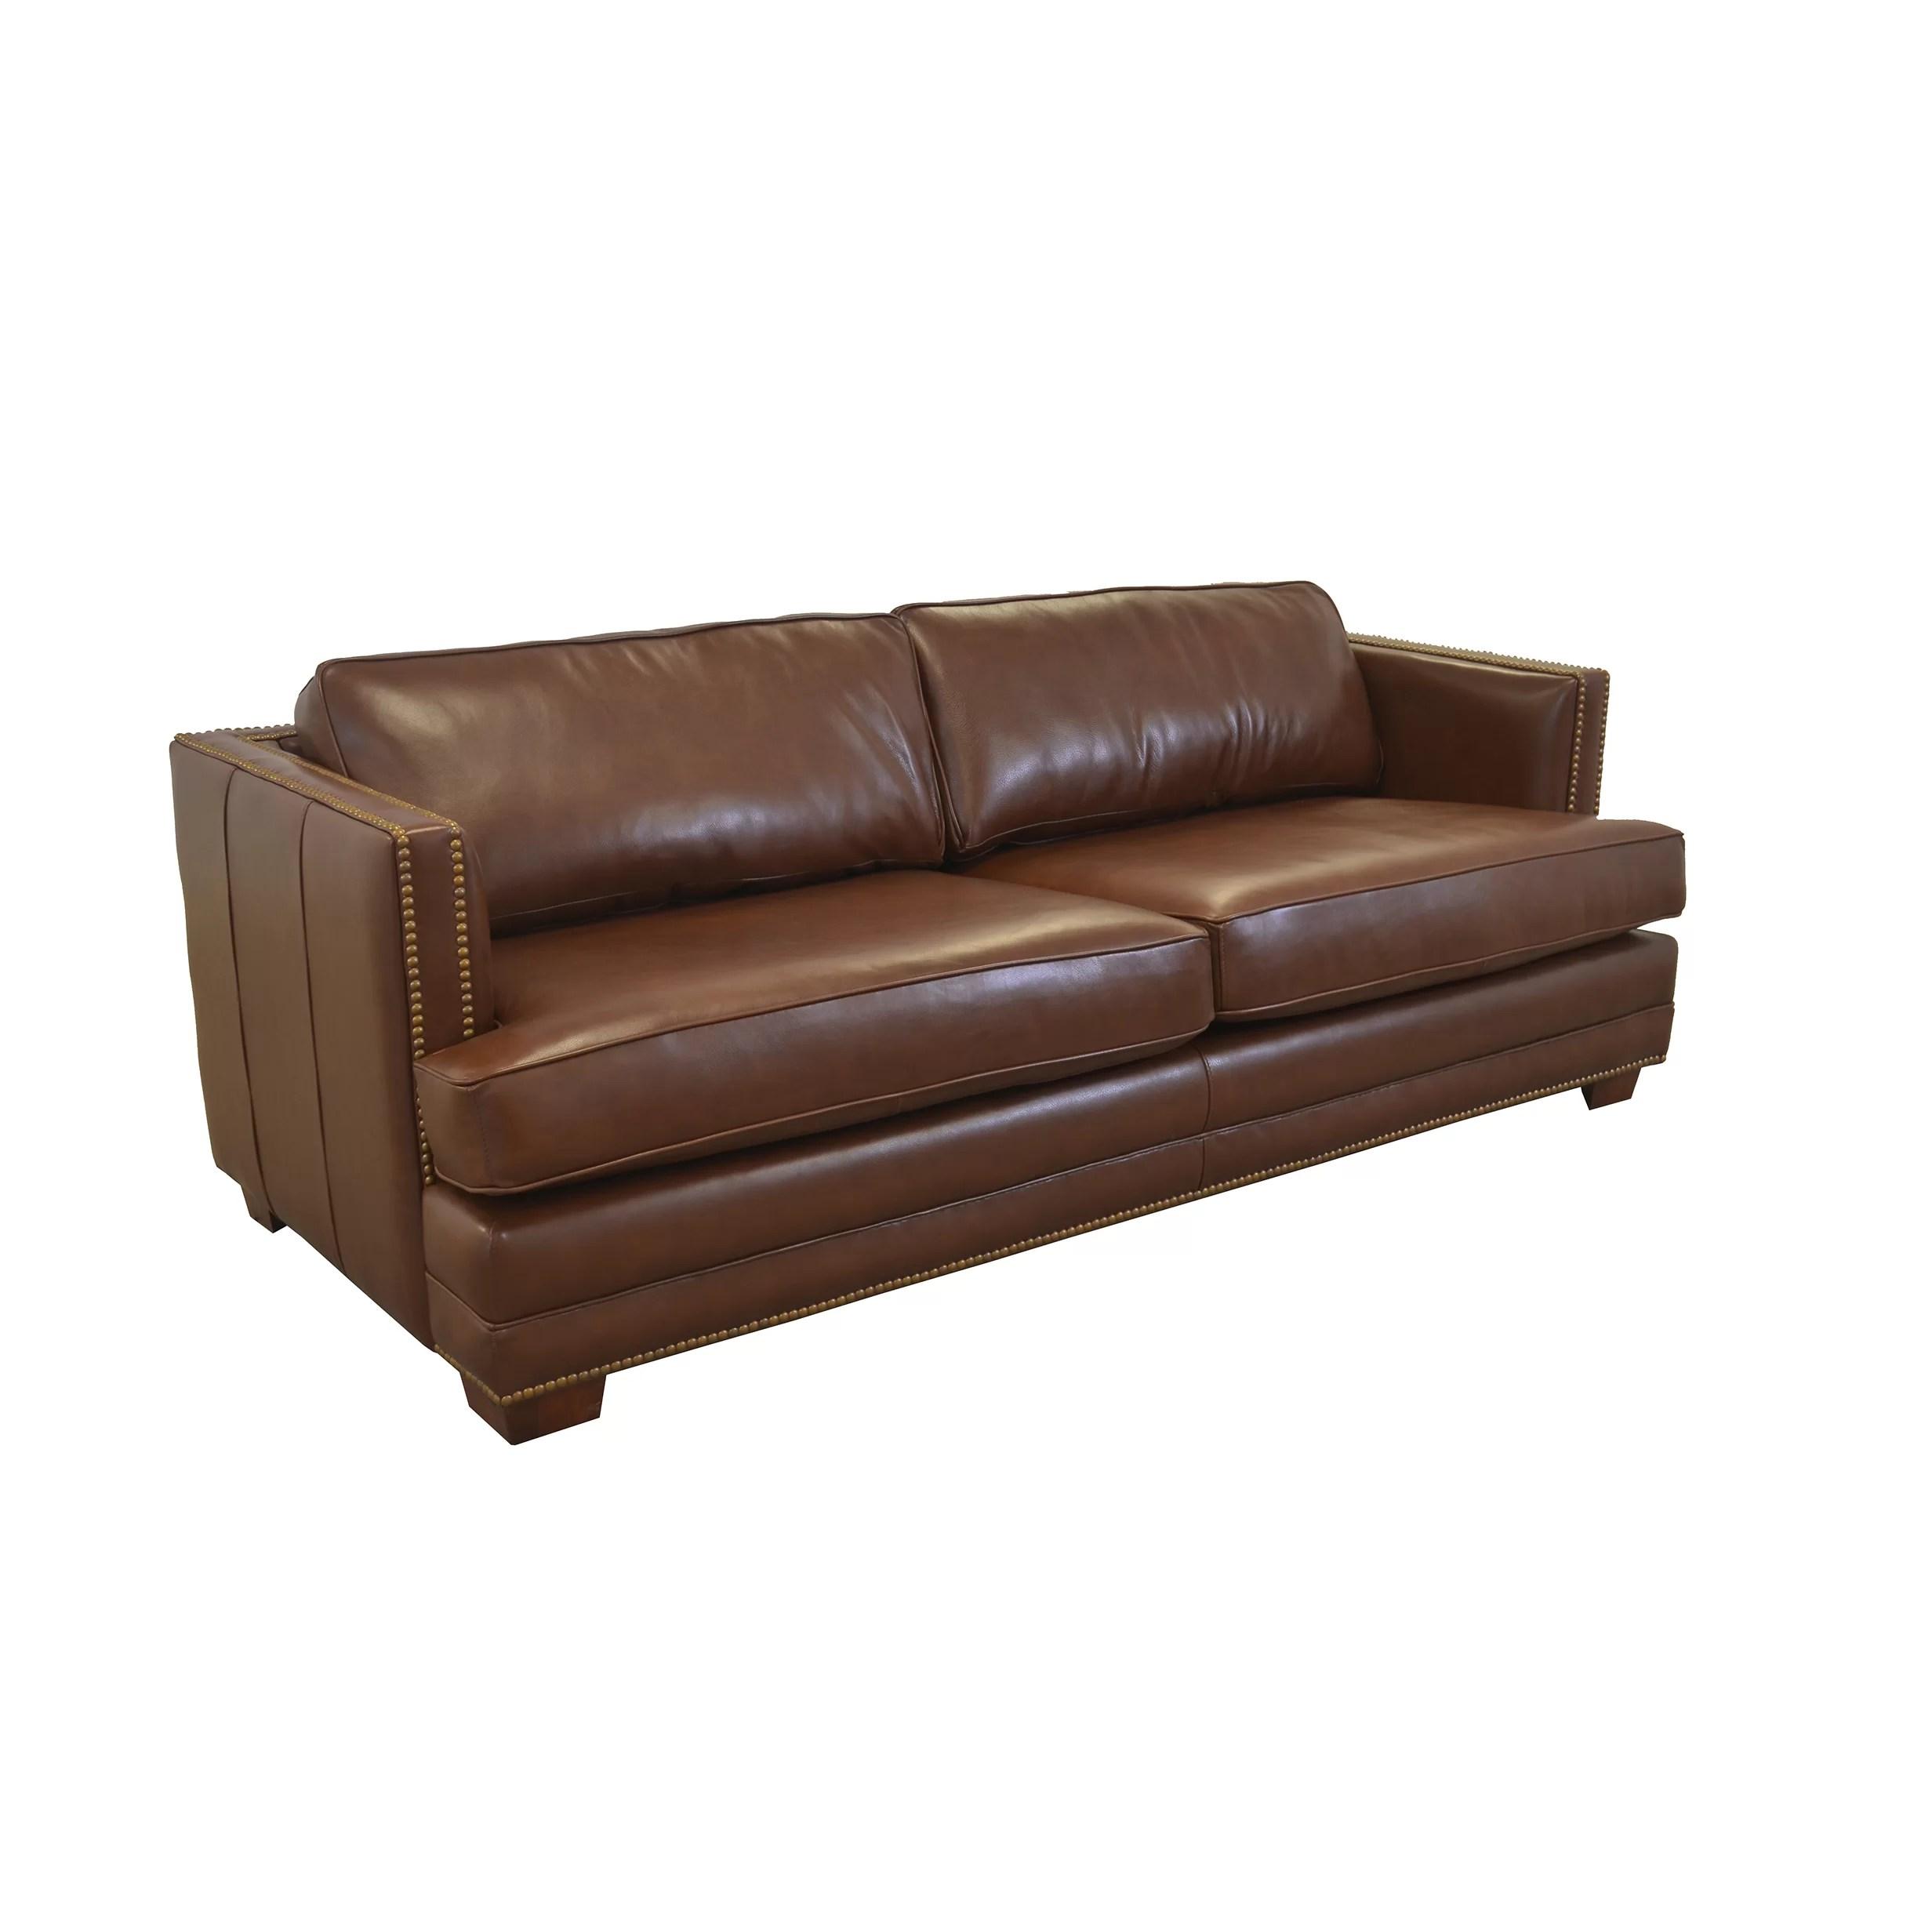 Westland and Birch Millbury Genuine Top Grain Leather Sofa